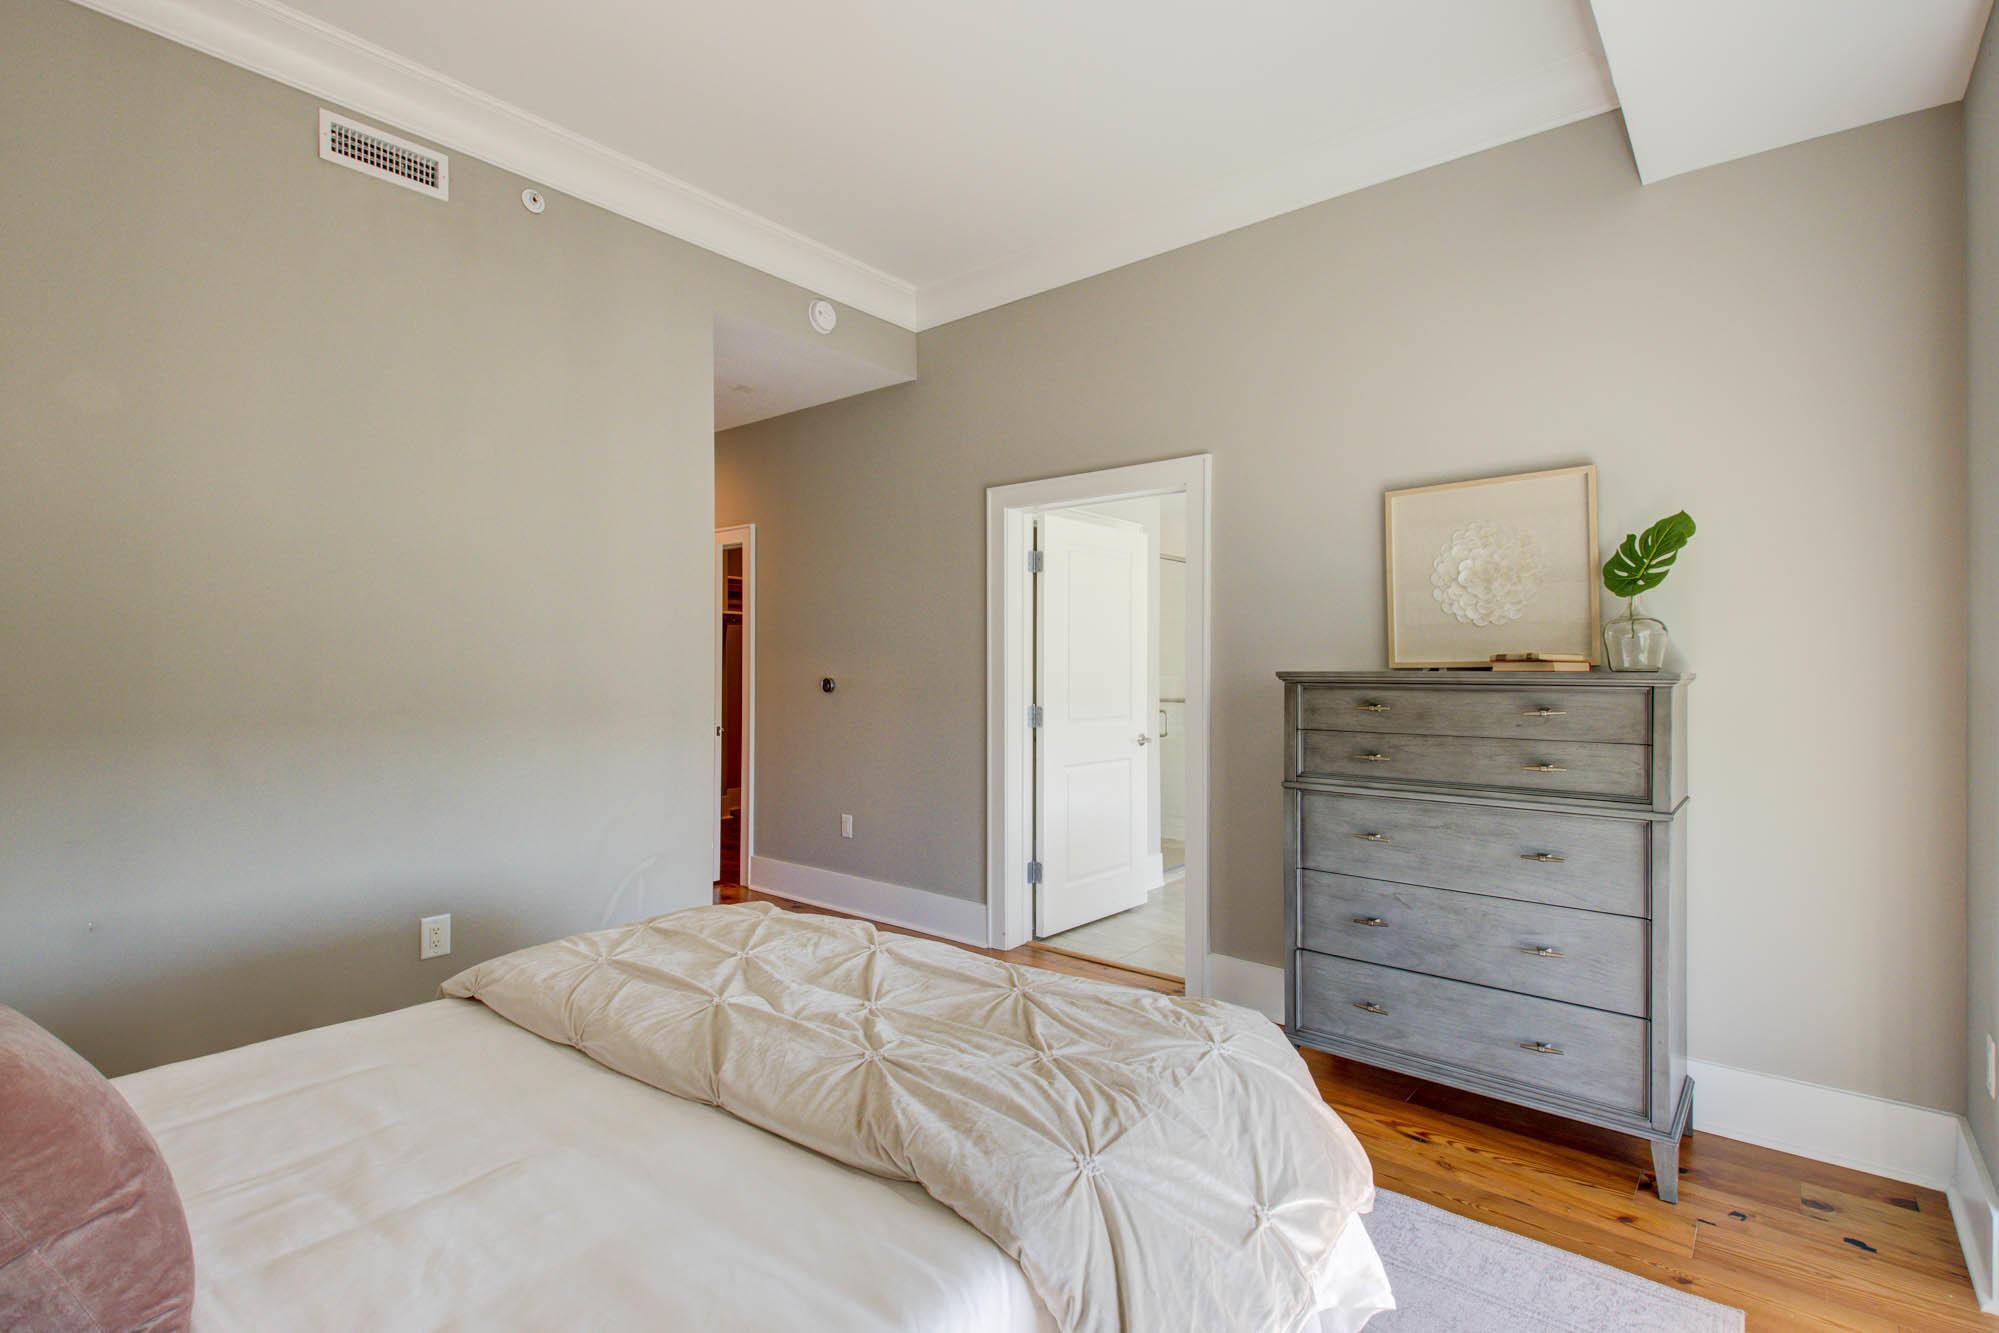 Tides IV Condominiums Homes For Sale - 155 Wingo, Mount Pleasant, SC - 33